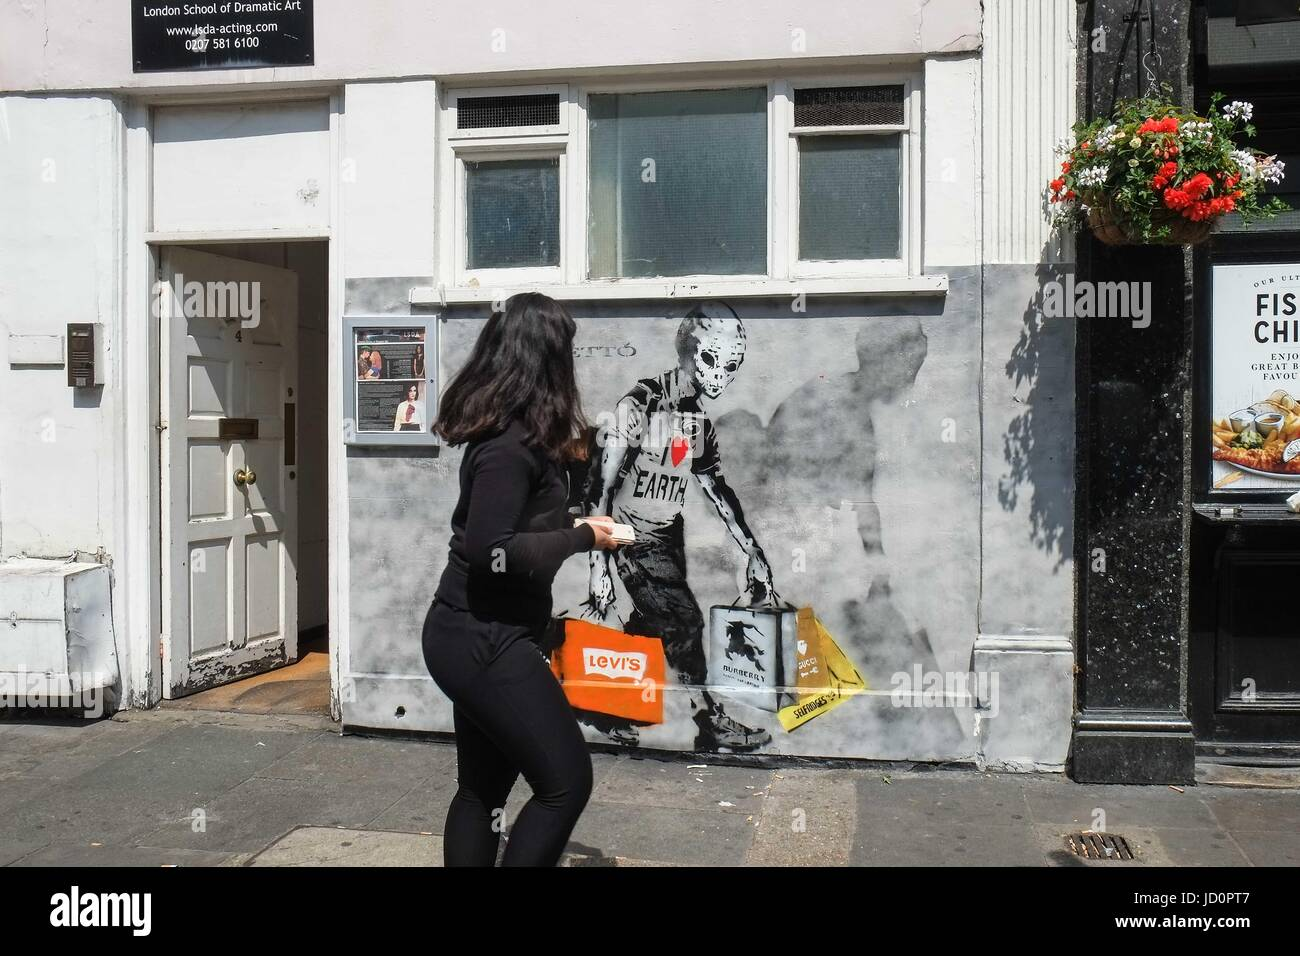 London: 17th June 2017. Graffiti on wall of London School of Dramatic Art Kensington. :Credit claire doherty Alamy/Live Stock Photo